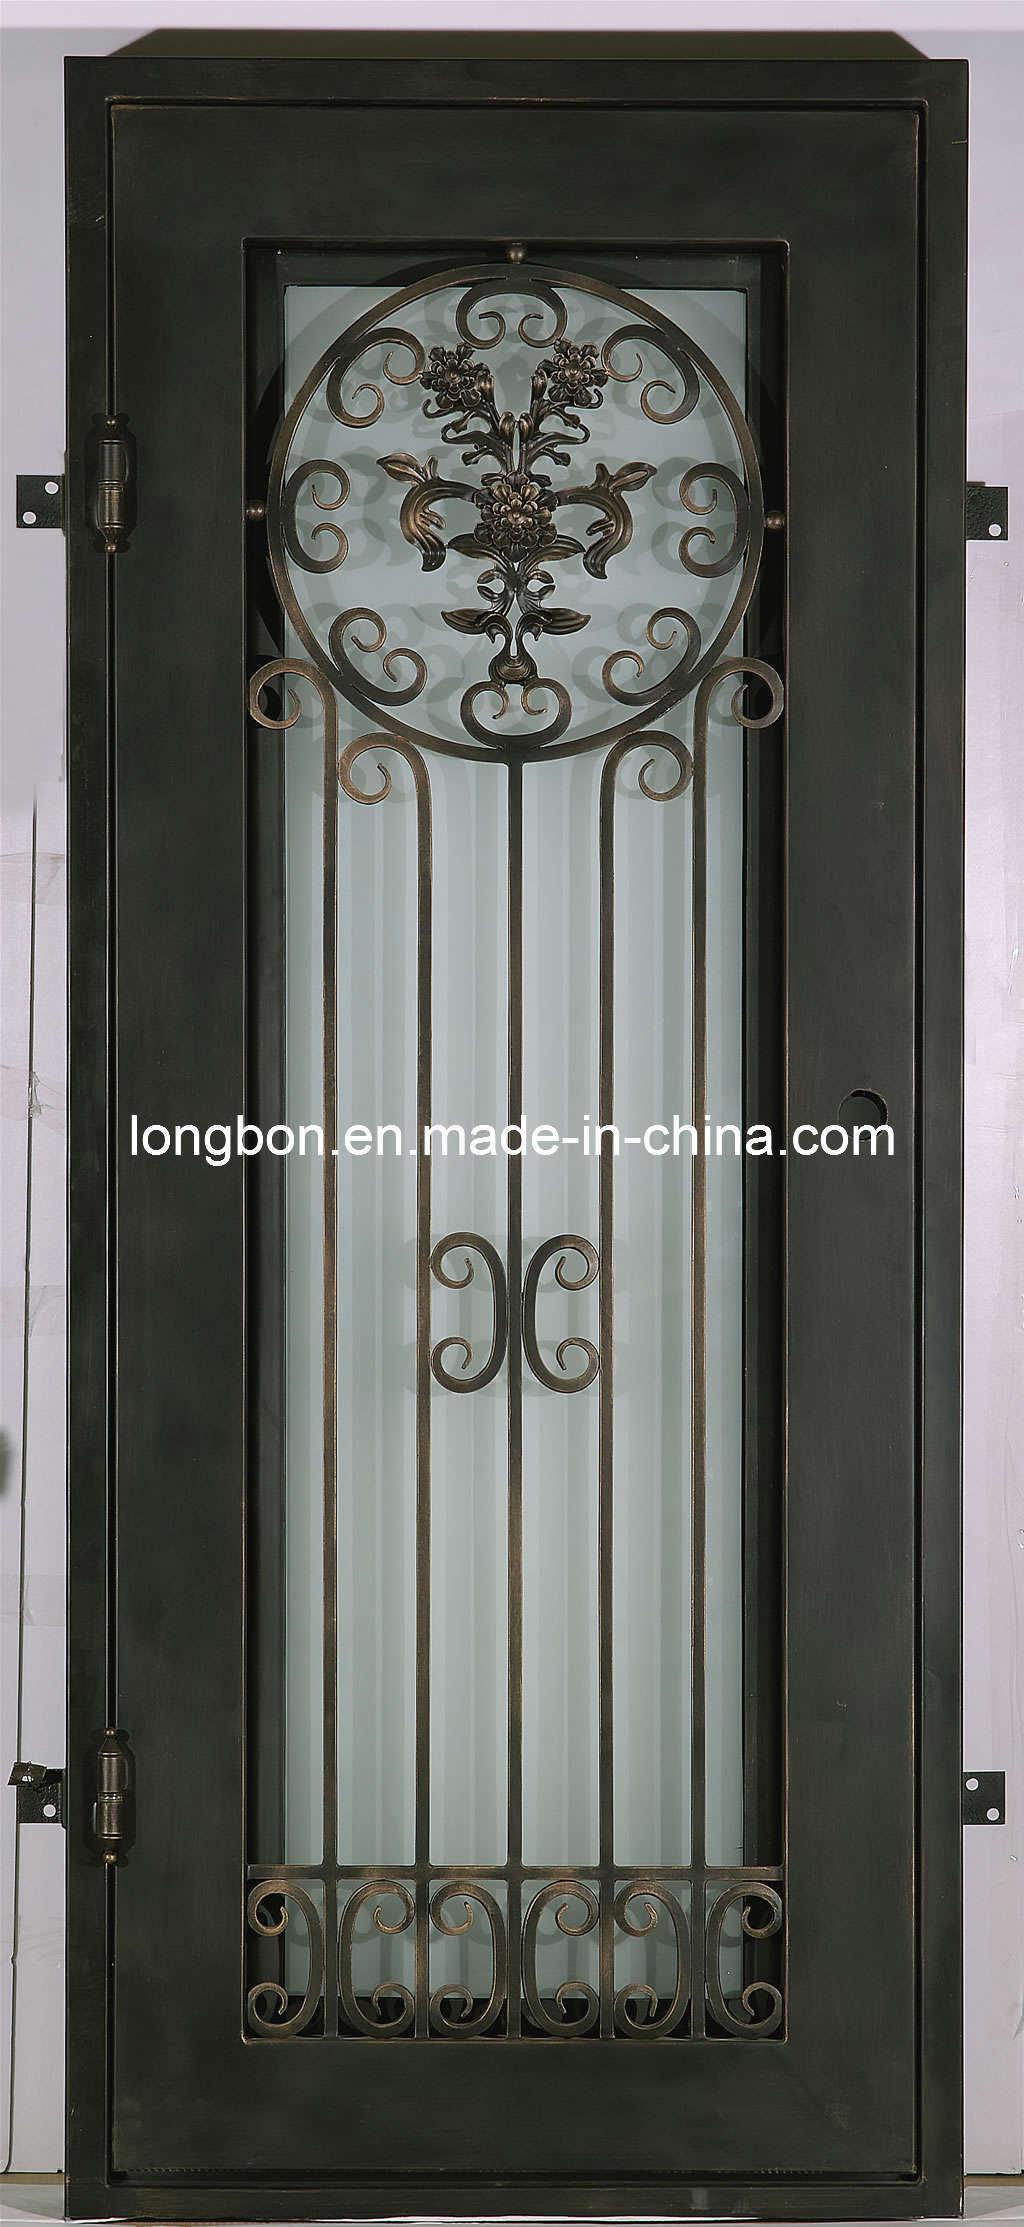 Puerta de entrada moderna del hierro labrado 2012 lb i d for Modelo de puerta principal de metal